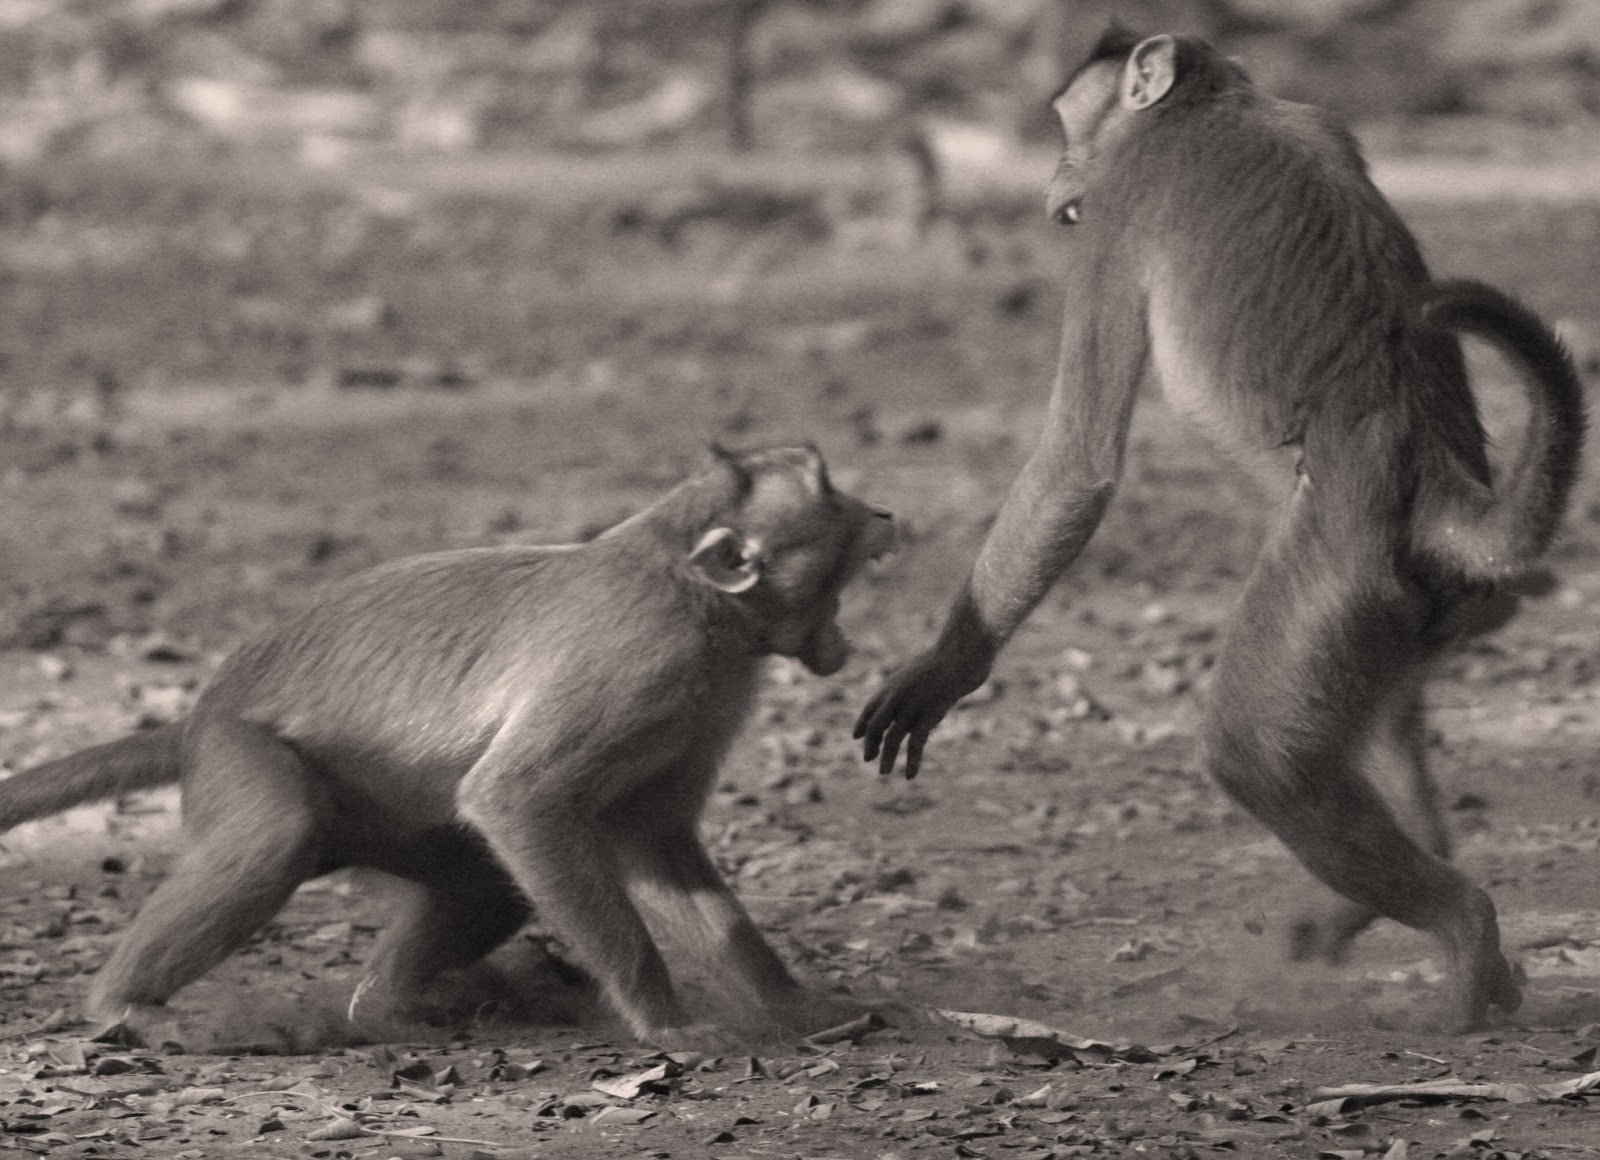 9916bcf38ac Sensible Self Defense: Not my circus. Not my monkeys